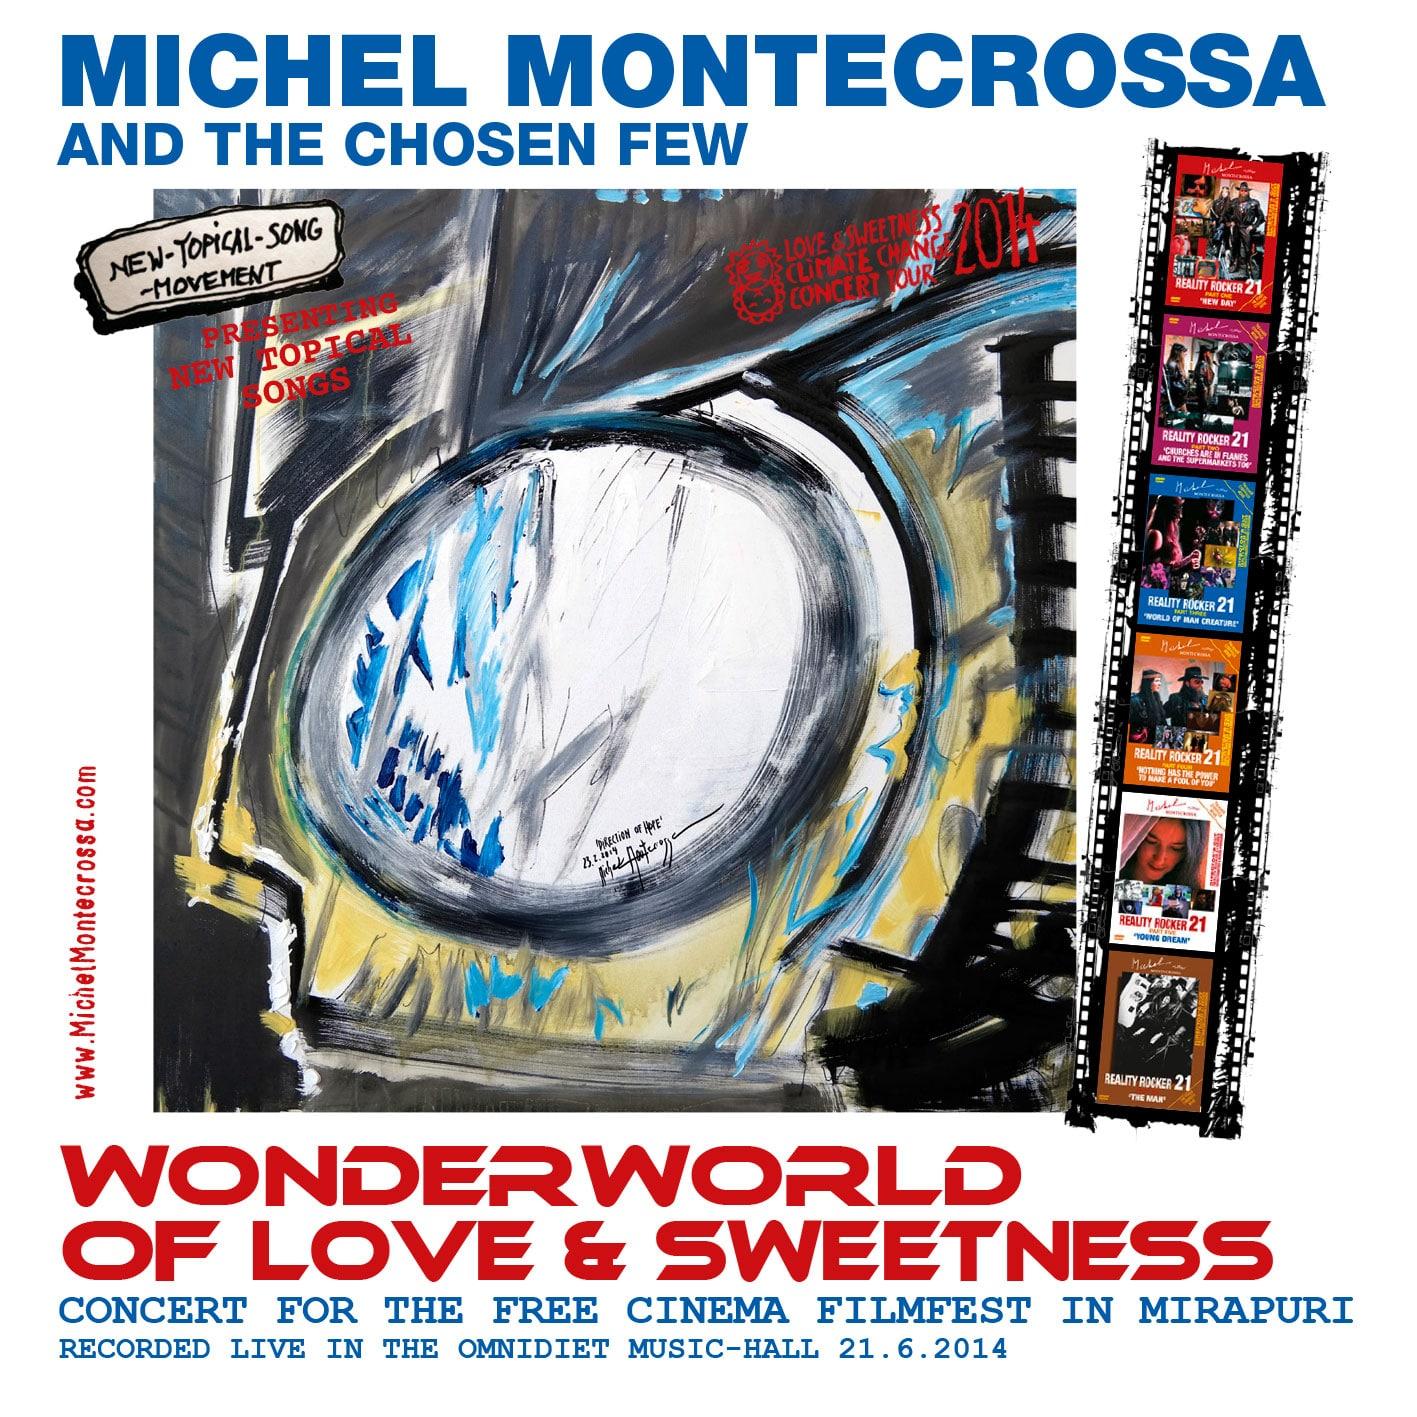 Wonderworld Of Love & Sweetness